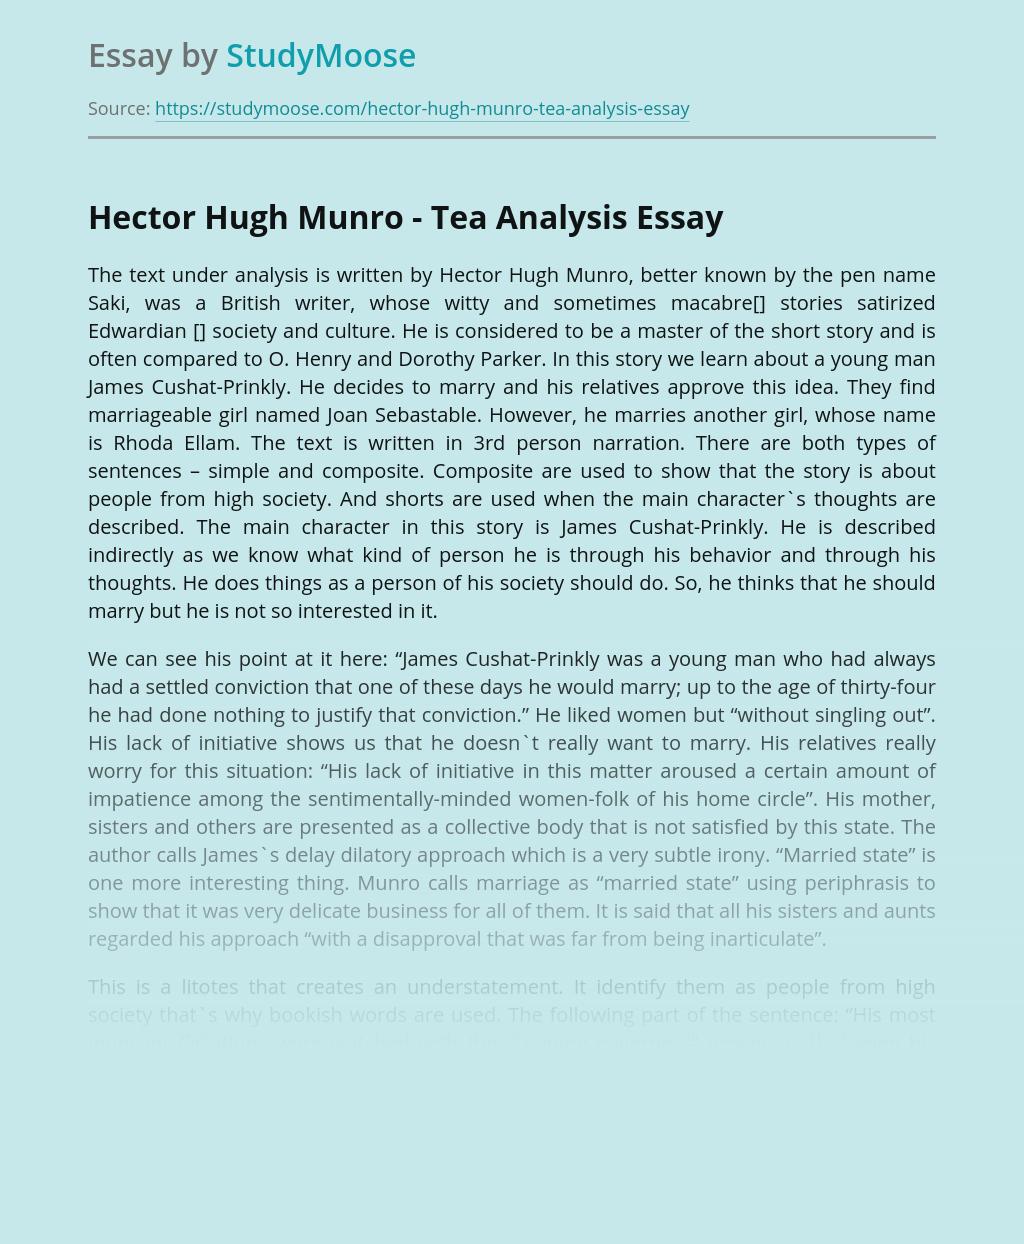 Hector Hugh Munro - Tea Analysis